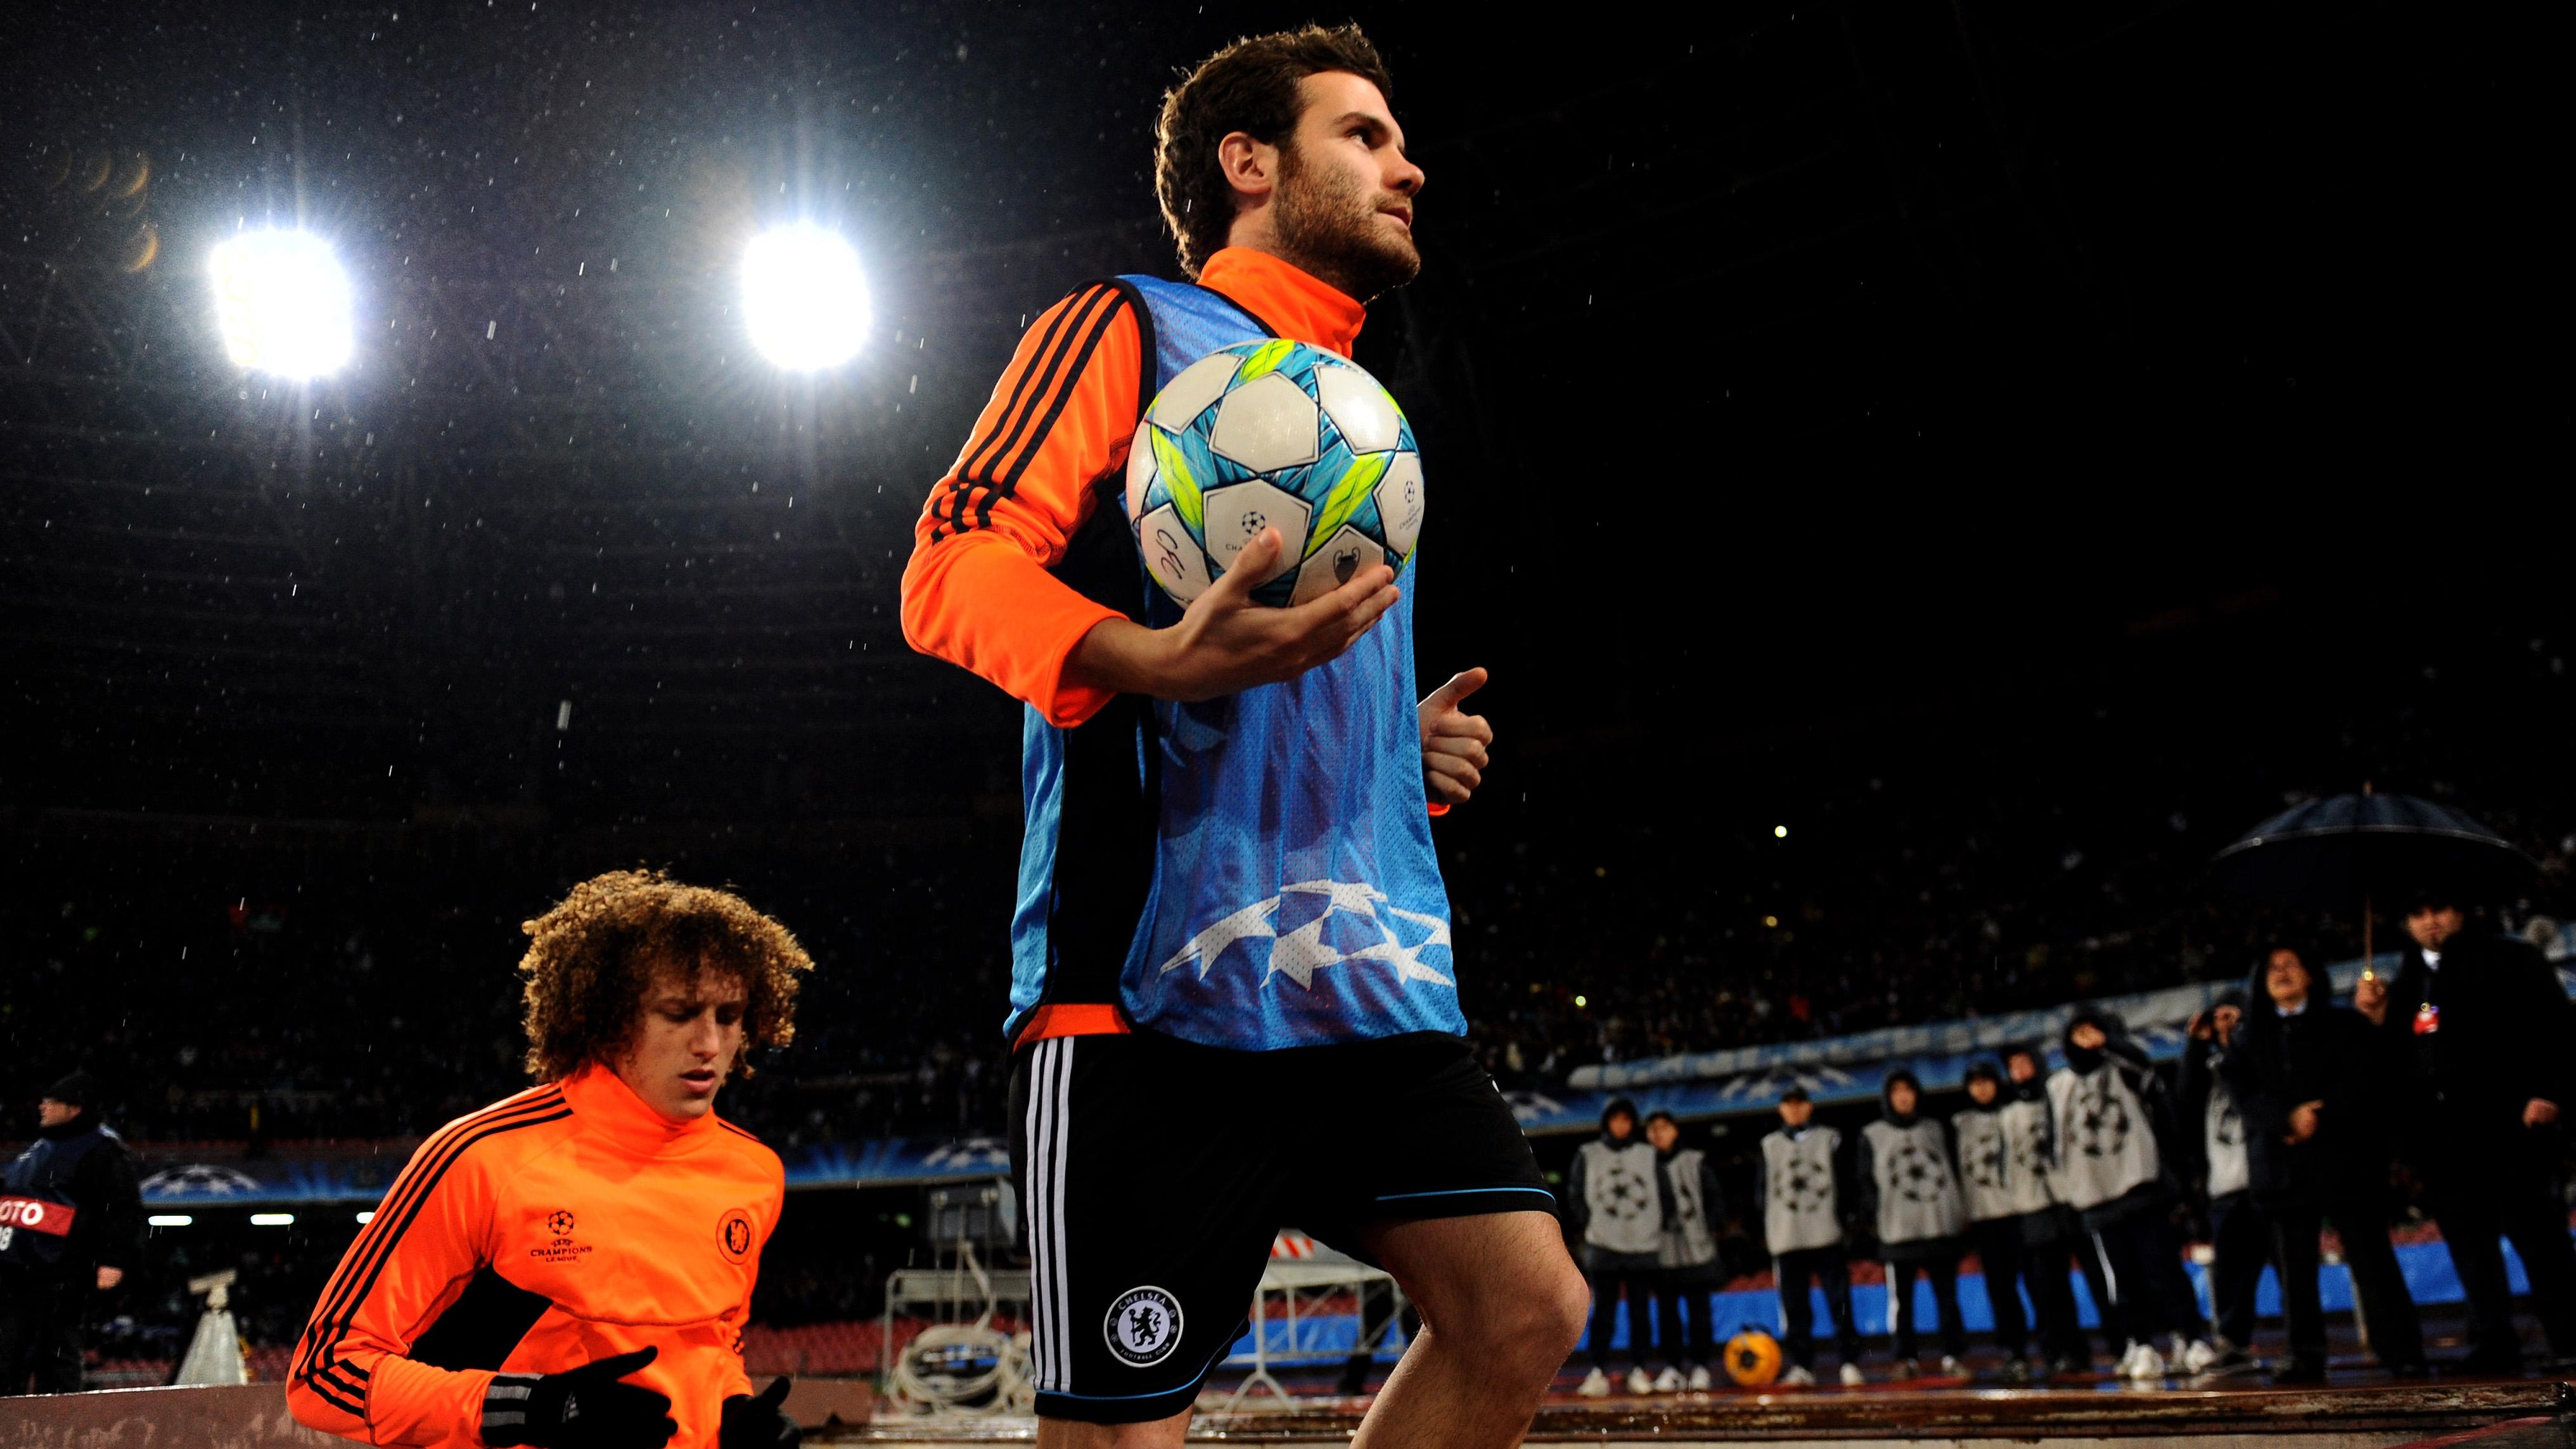 SSC Napoli v Chelsea FC - UEFA Champions League Round of 16